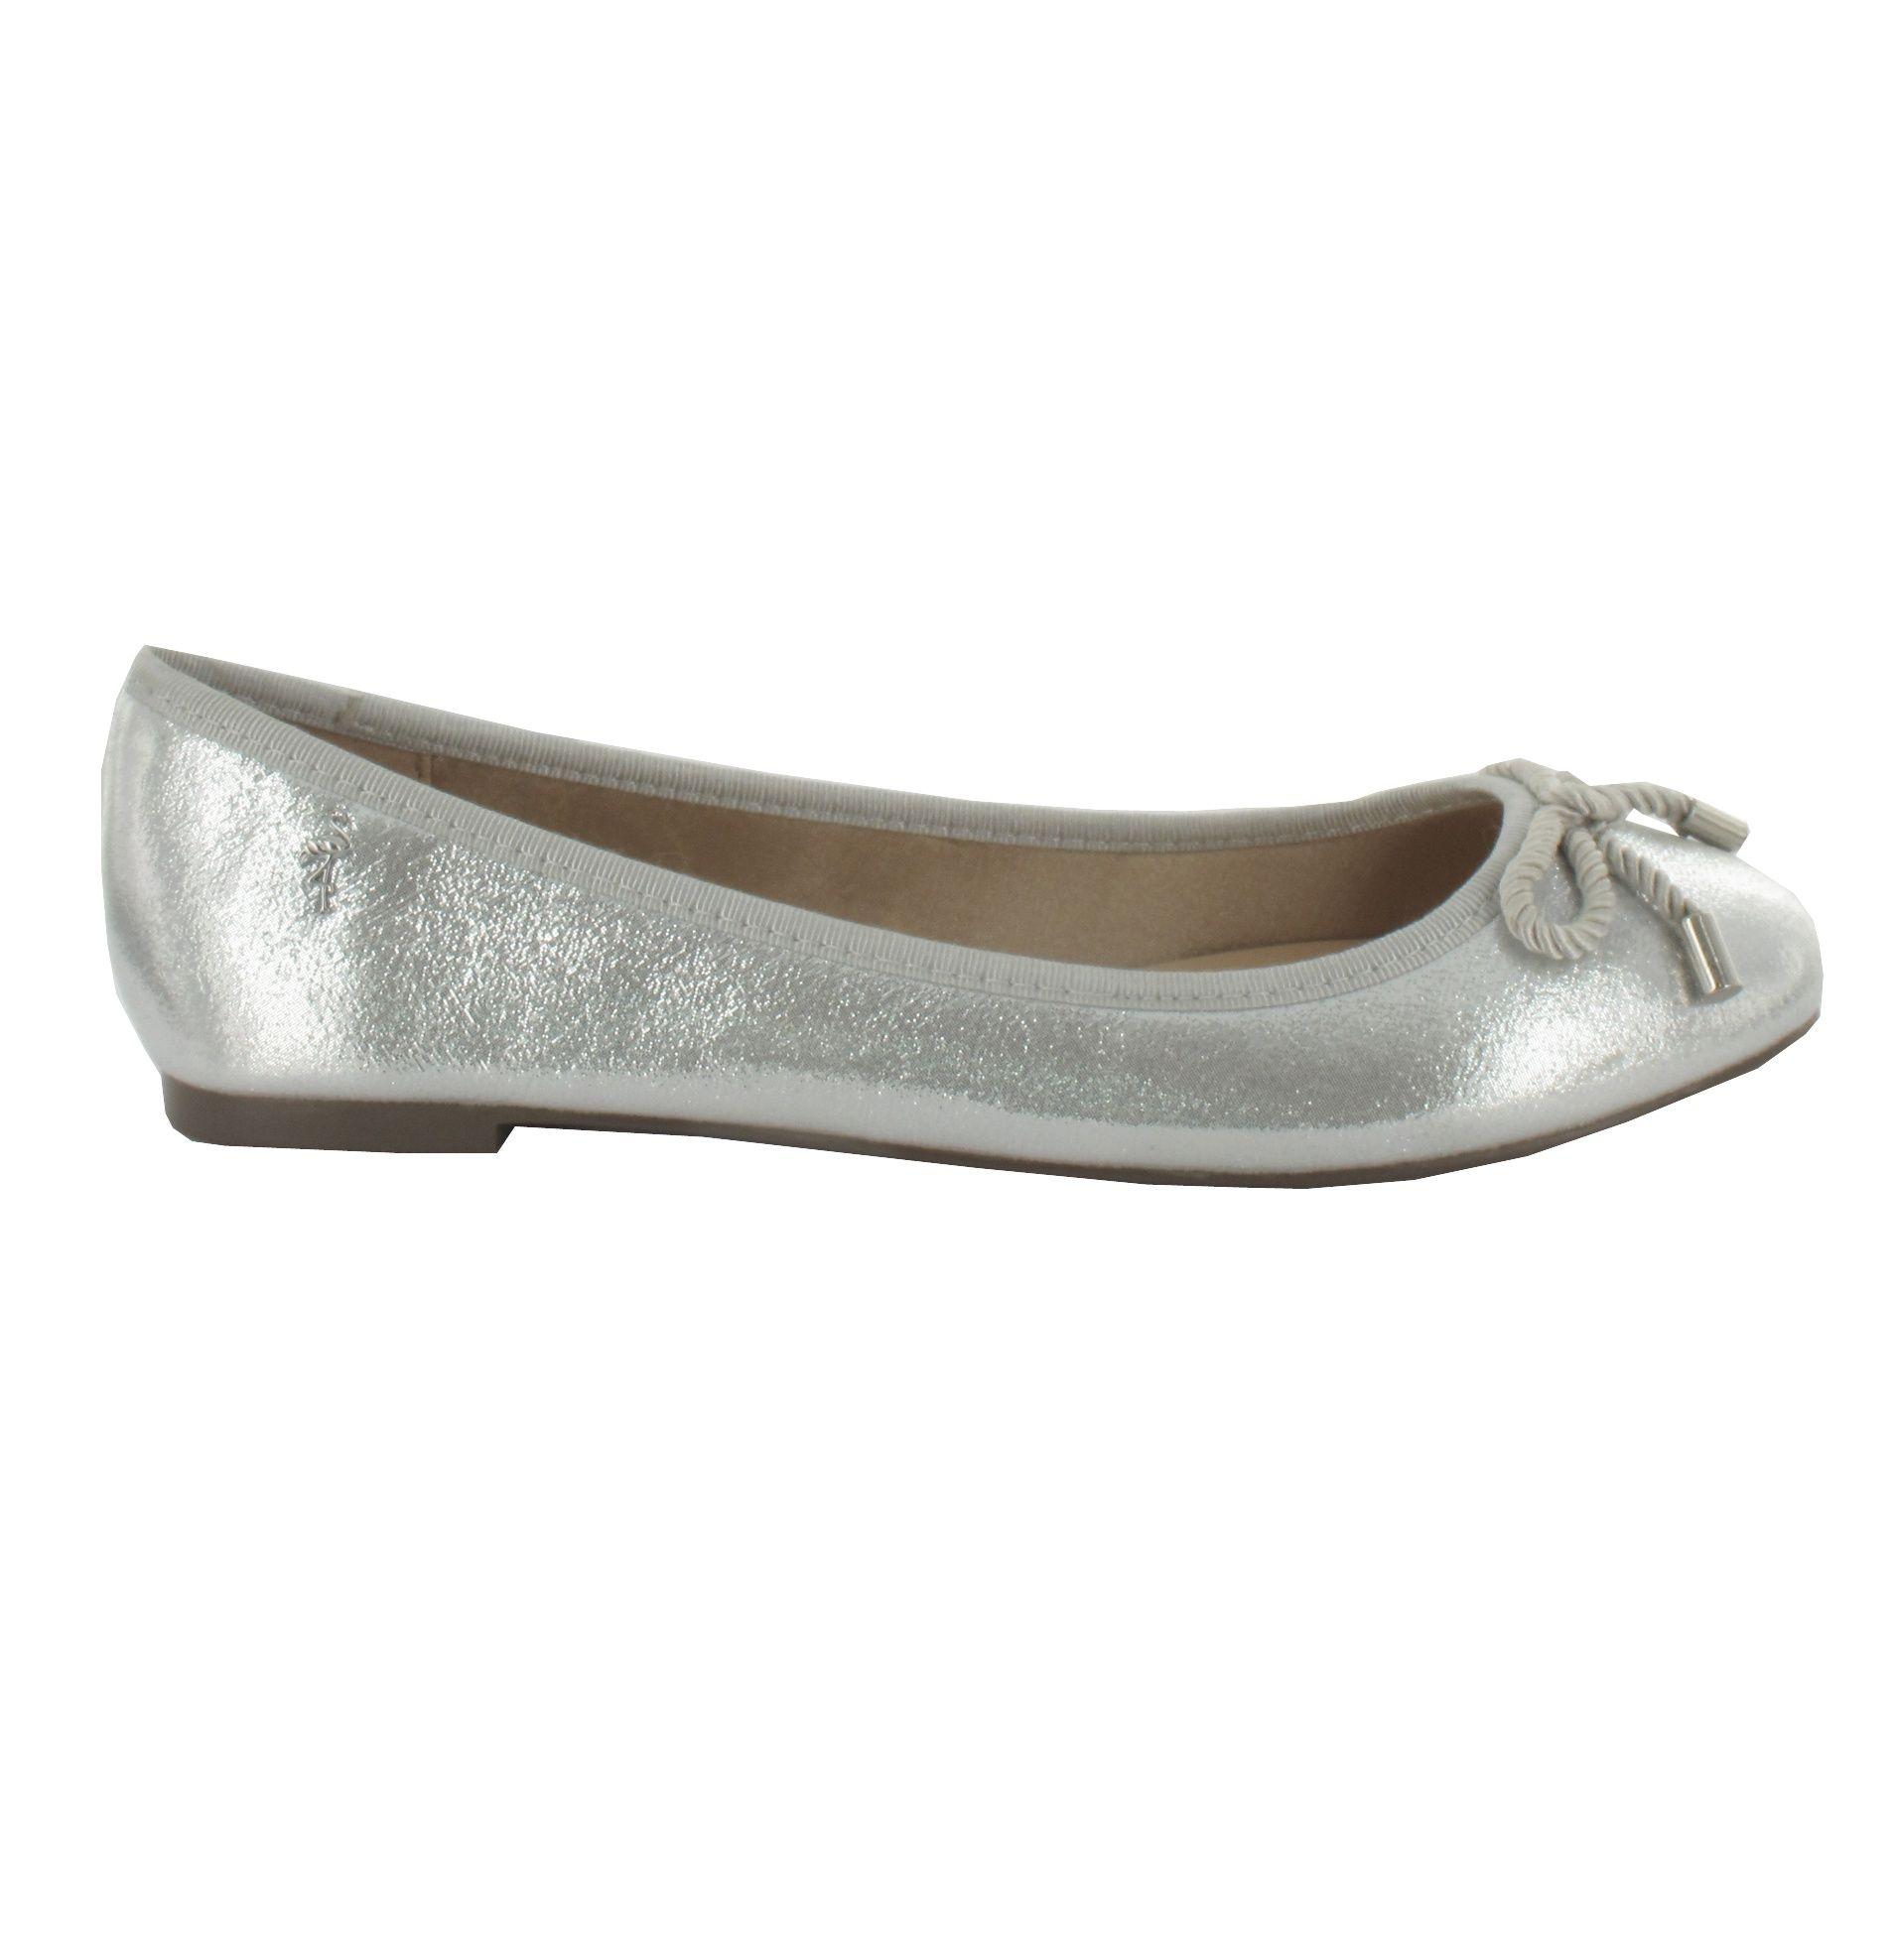 Bailarina en tono Plateado con lazo. La clásica bailarina con un exterior elegante. Ref.6894 //Ballerina shoe in Silver with bow detail .The classic Ballerina with an elegant outer appearance. Ref.6894